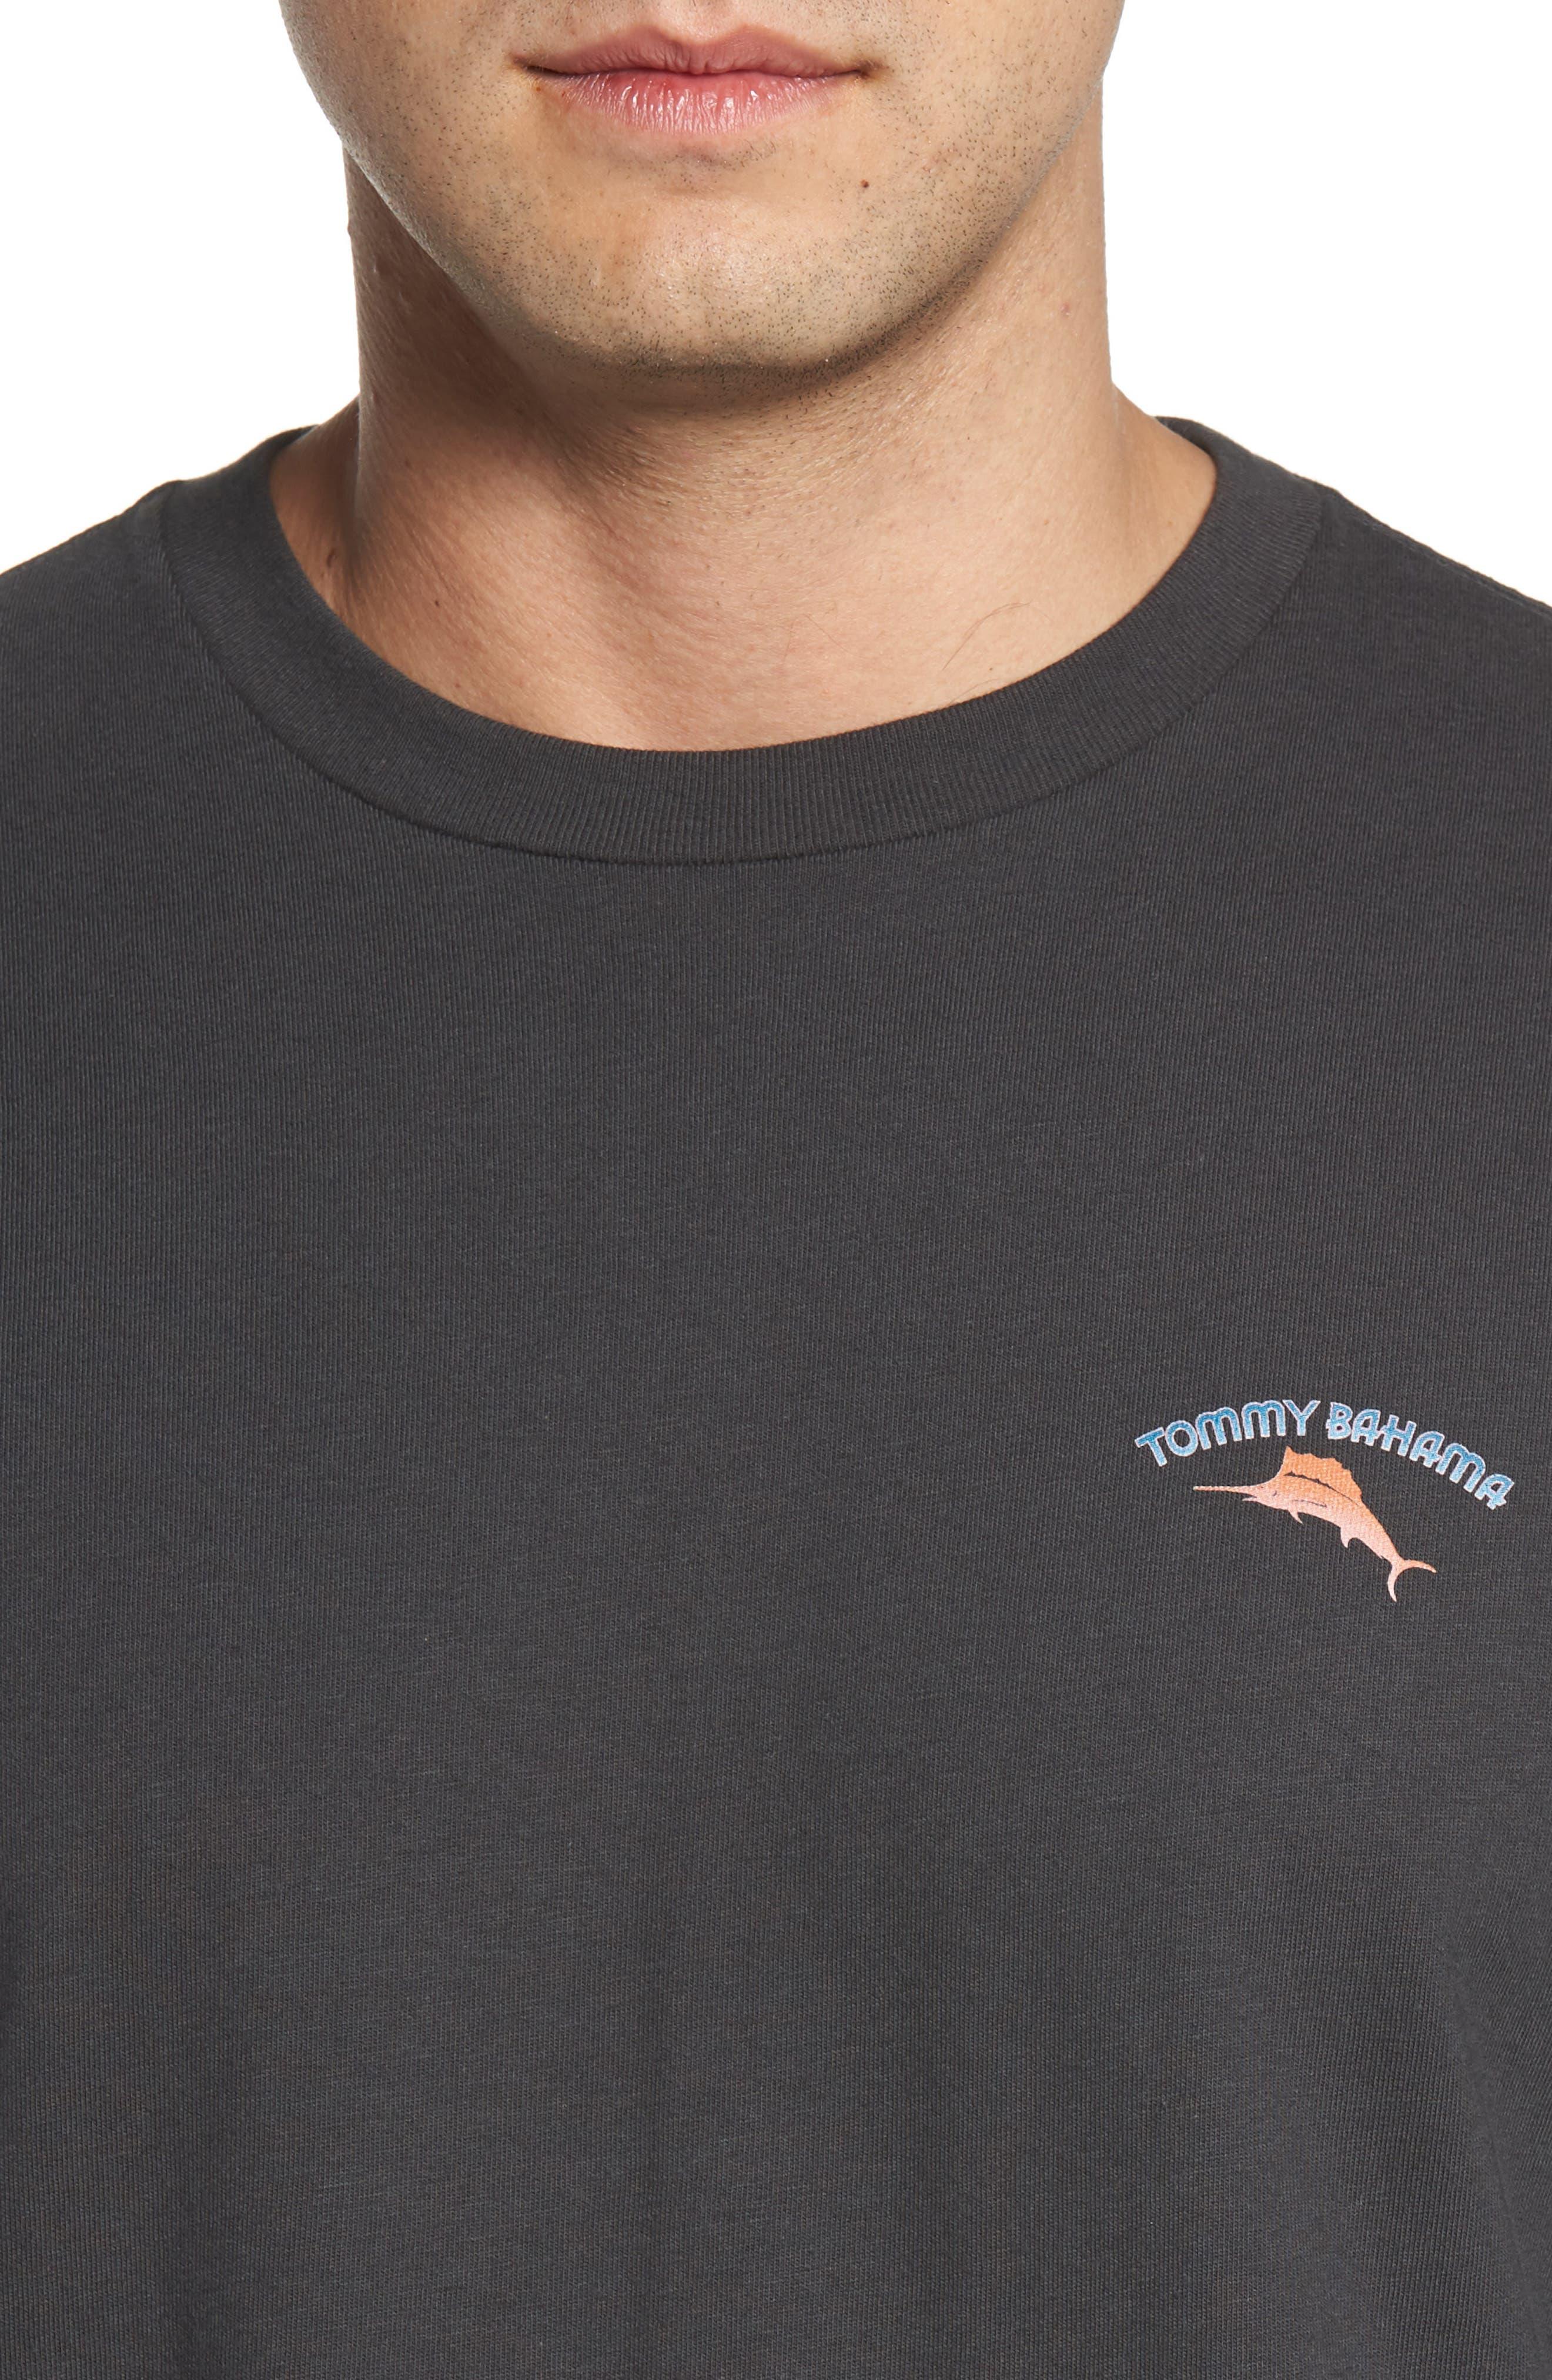 Bromingos T-Shirt,                             Alternate thumbnail 4, color,                             Coal